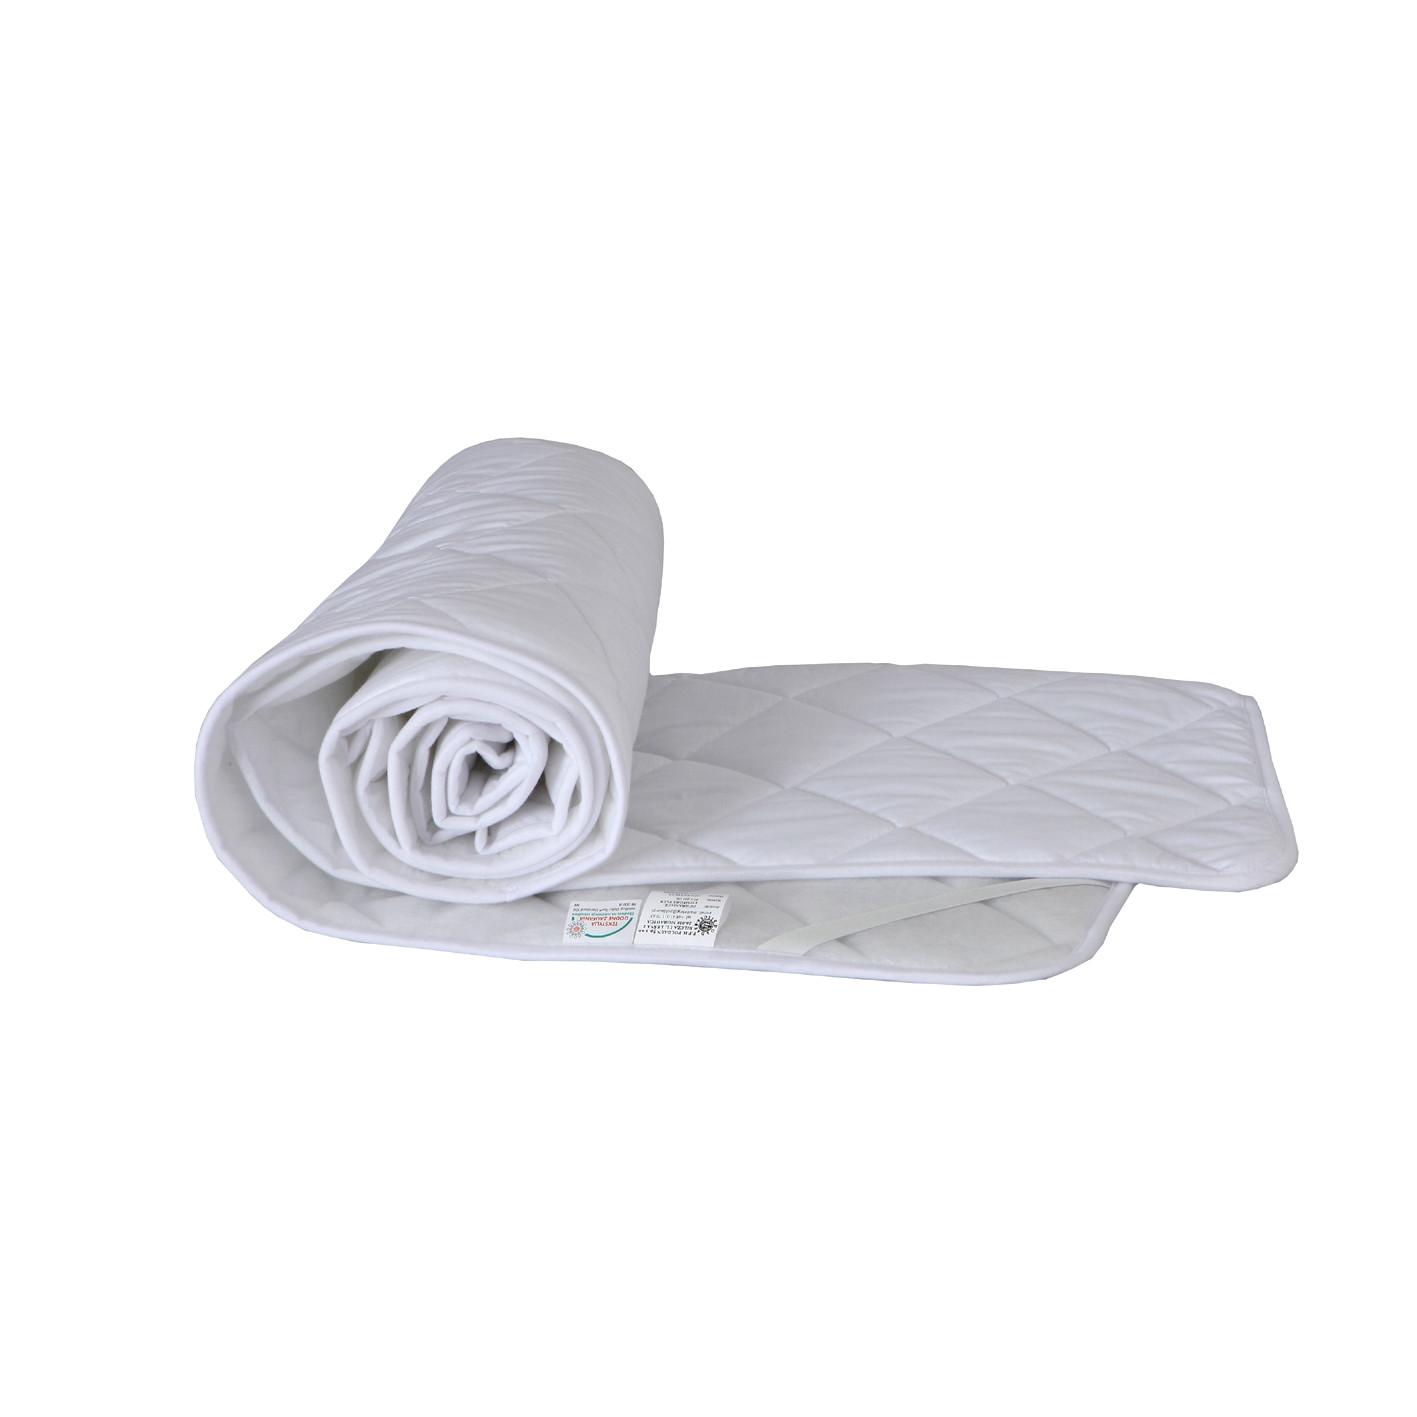 Ochraniacz na materac  Comfort Plus 120x200